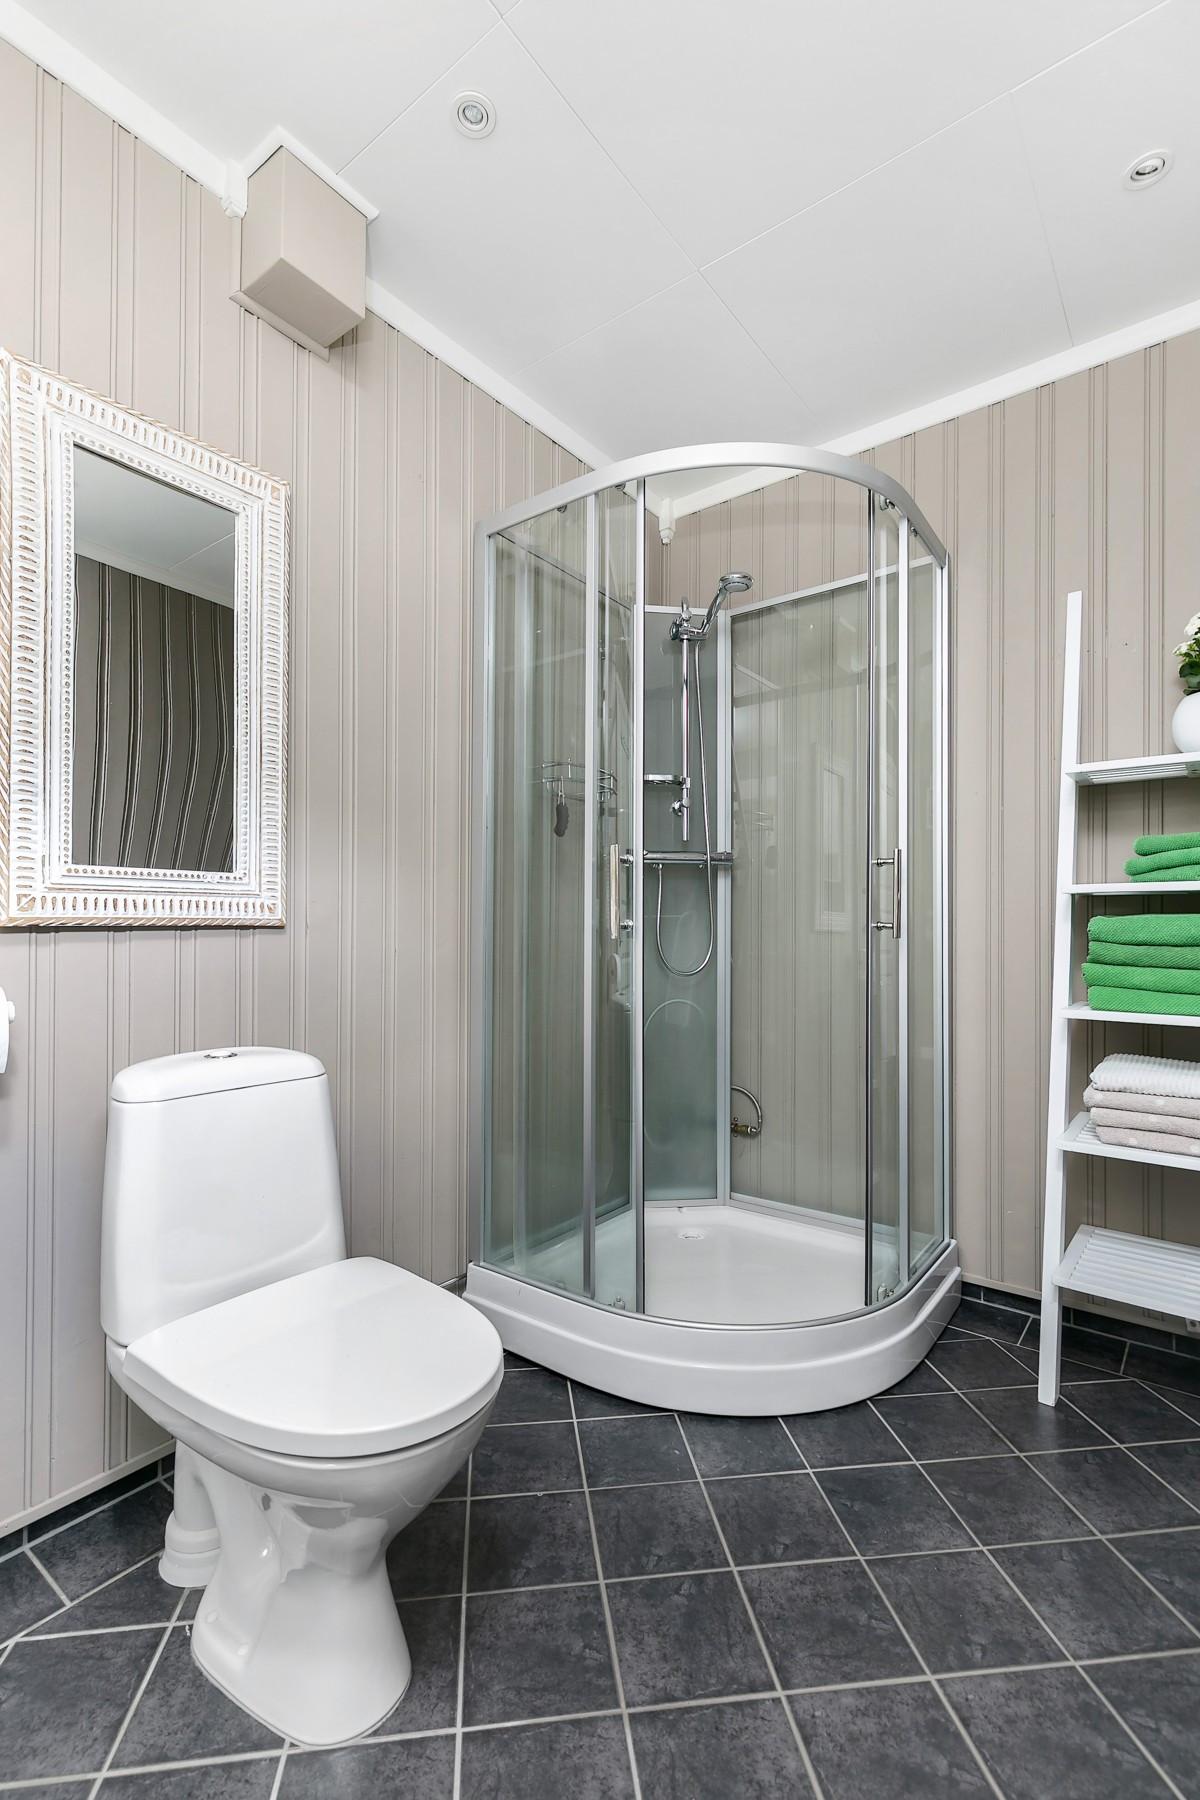 Praktisk med baderom i samme etasje som hovedsoverom og stue